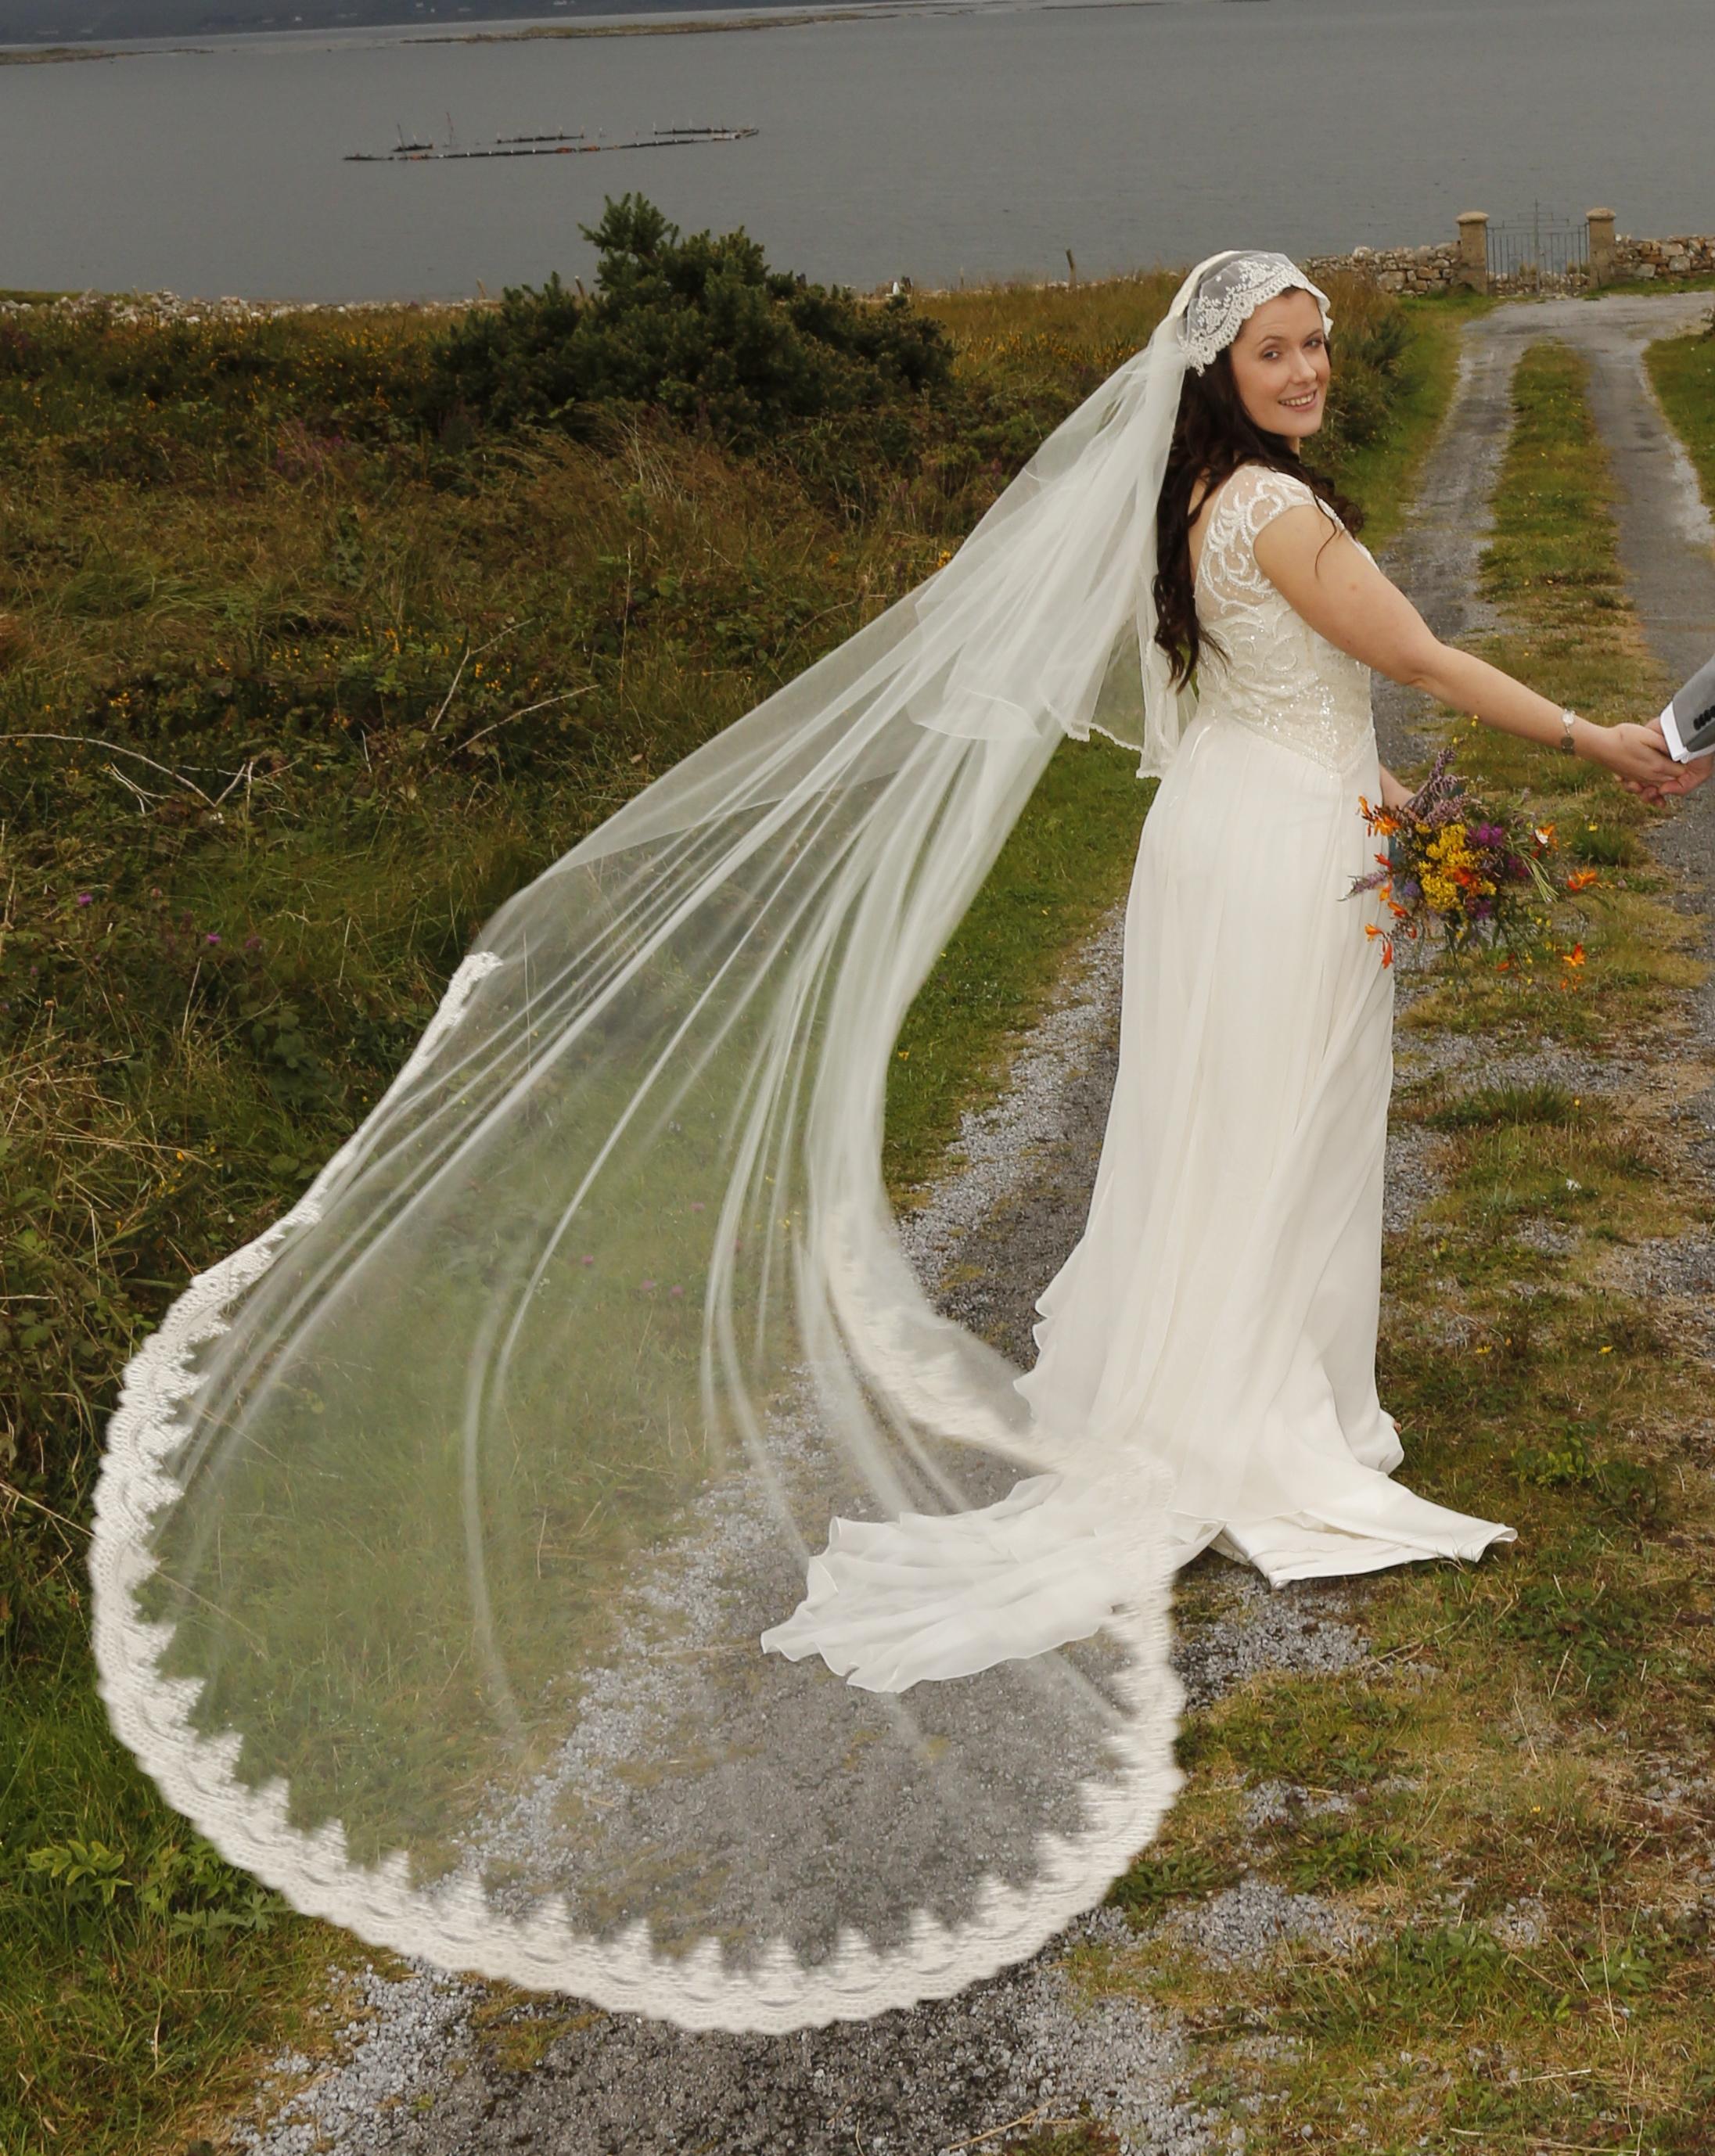 a49e647f9562 Visionary Veils Veil Real Bride Designs worthy of any Royal Princess